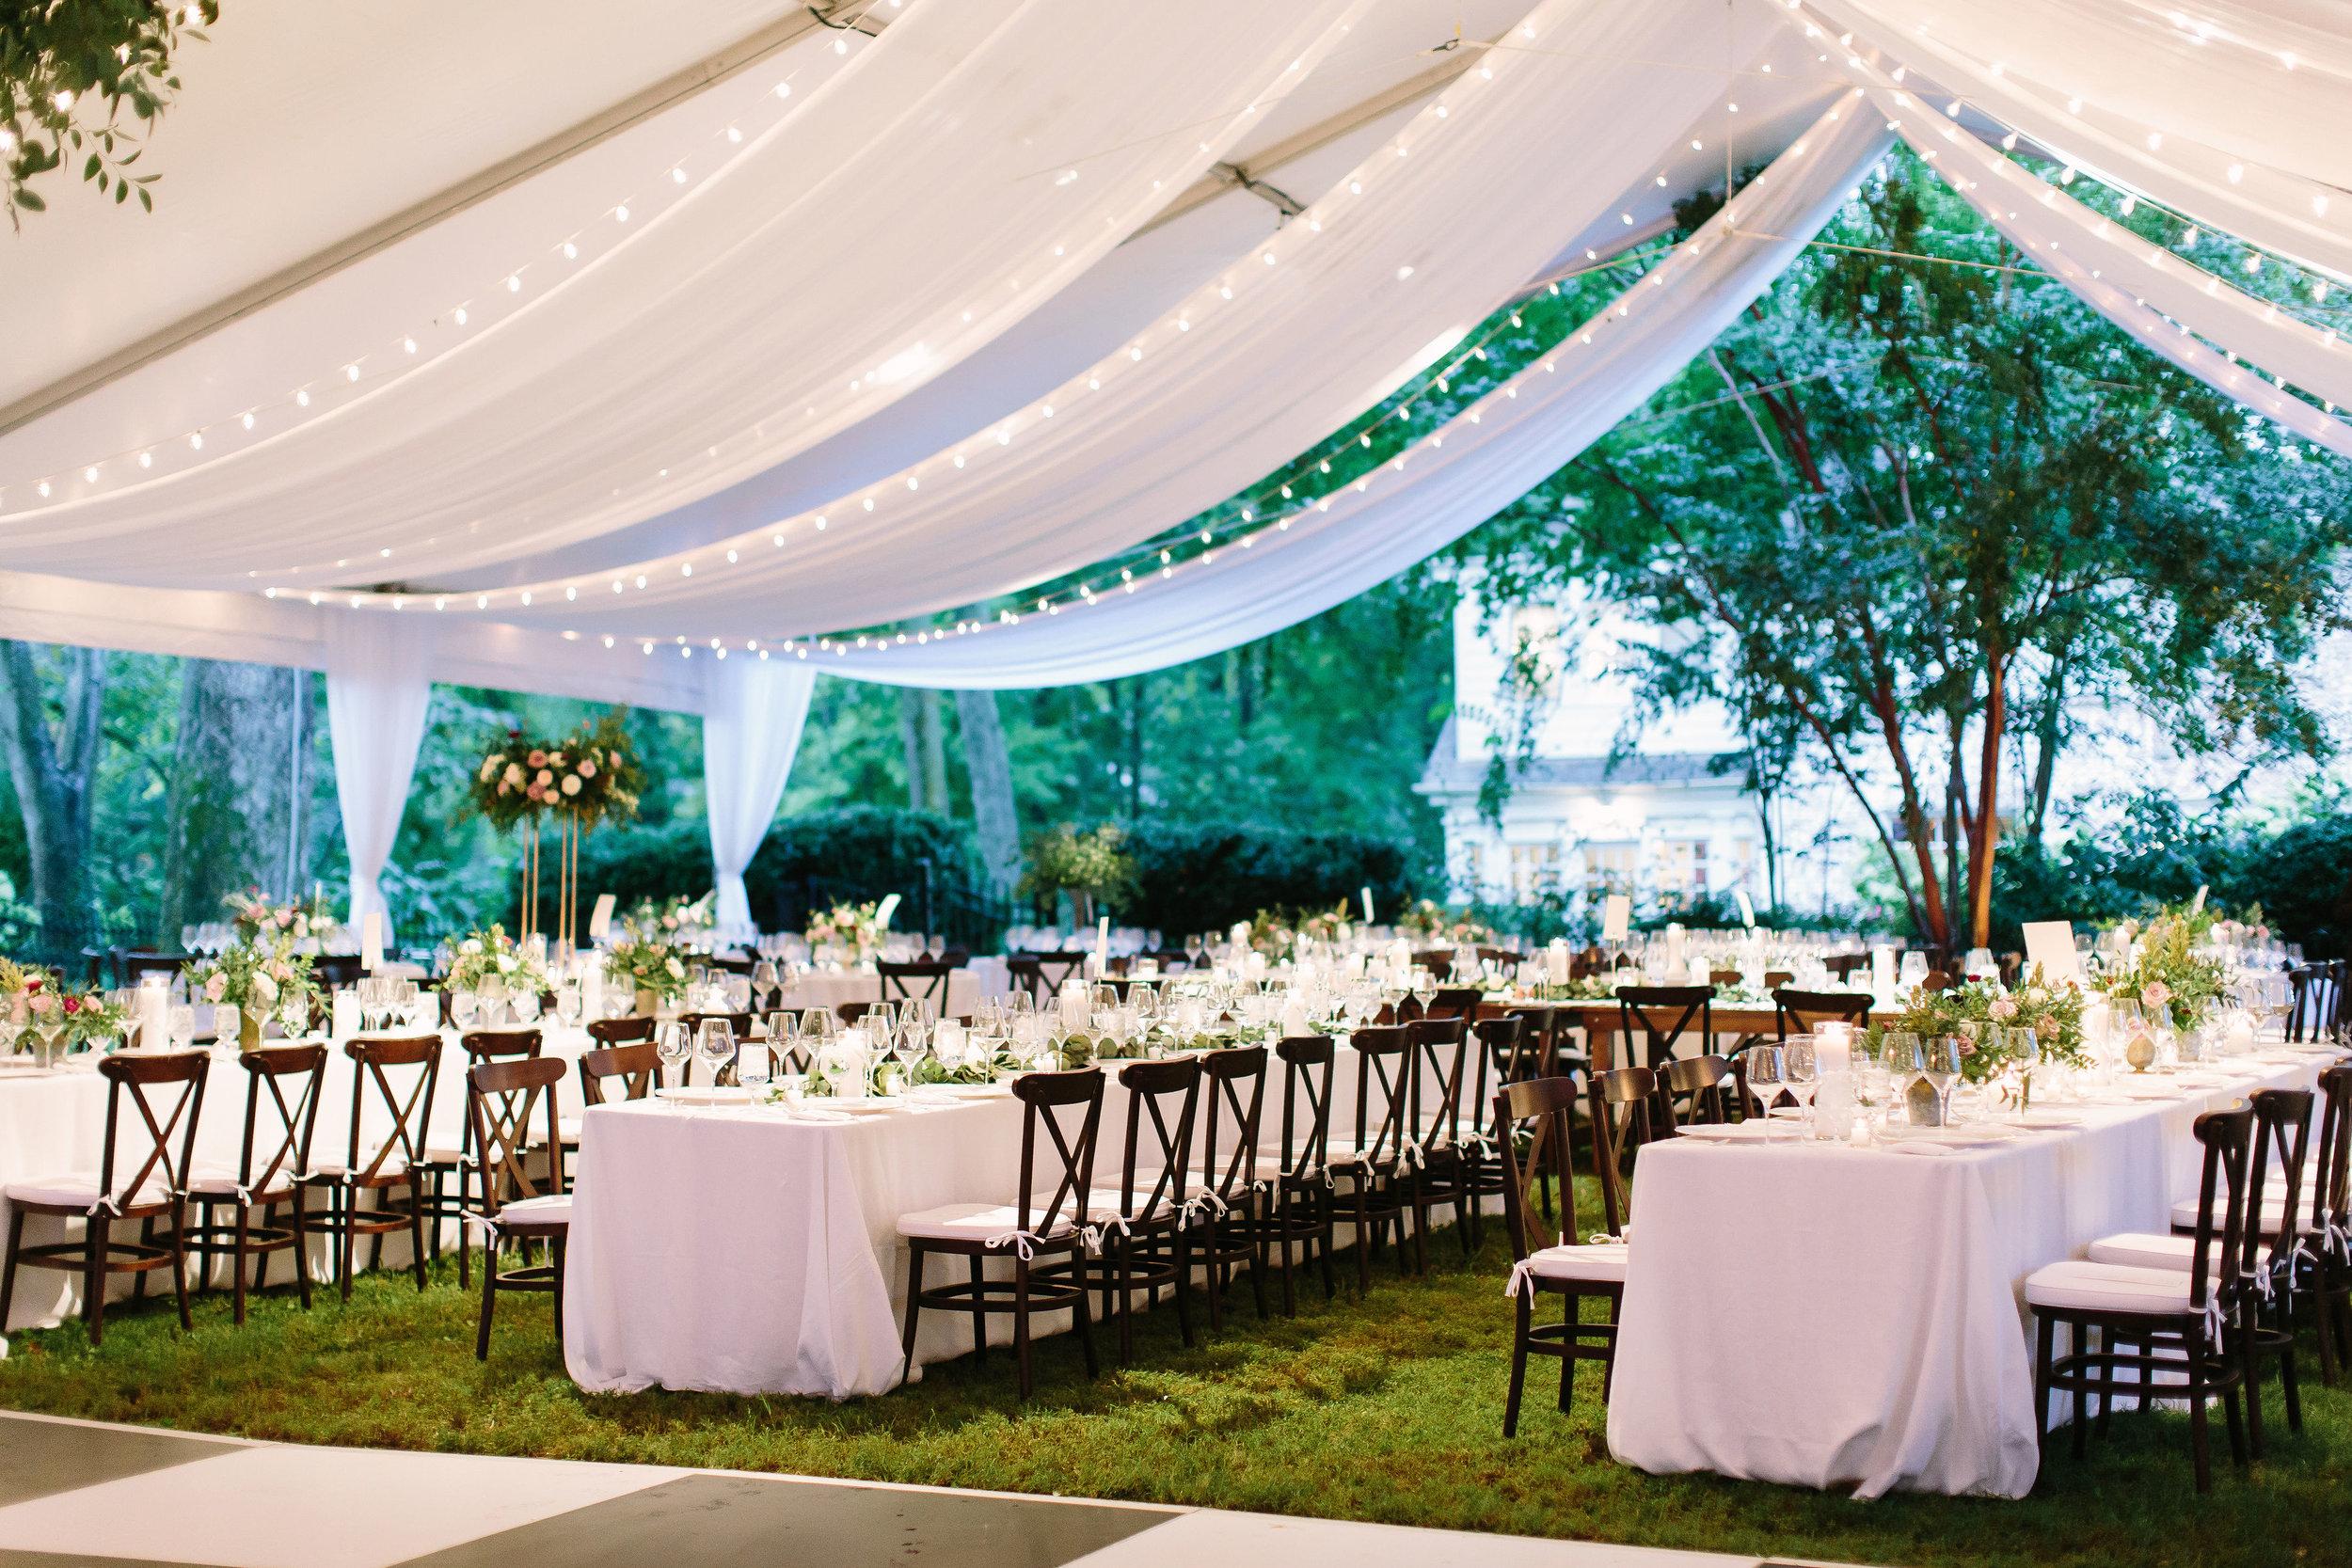 Tented backyard wedding // Belle Meade Wedding Floral Design